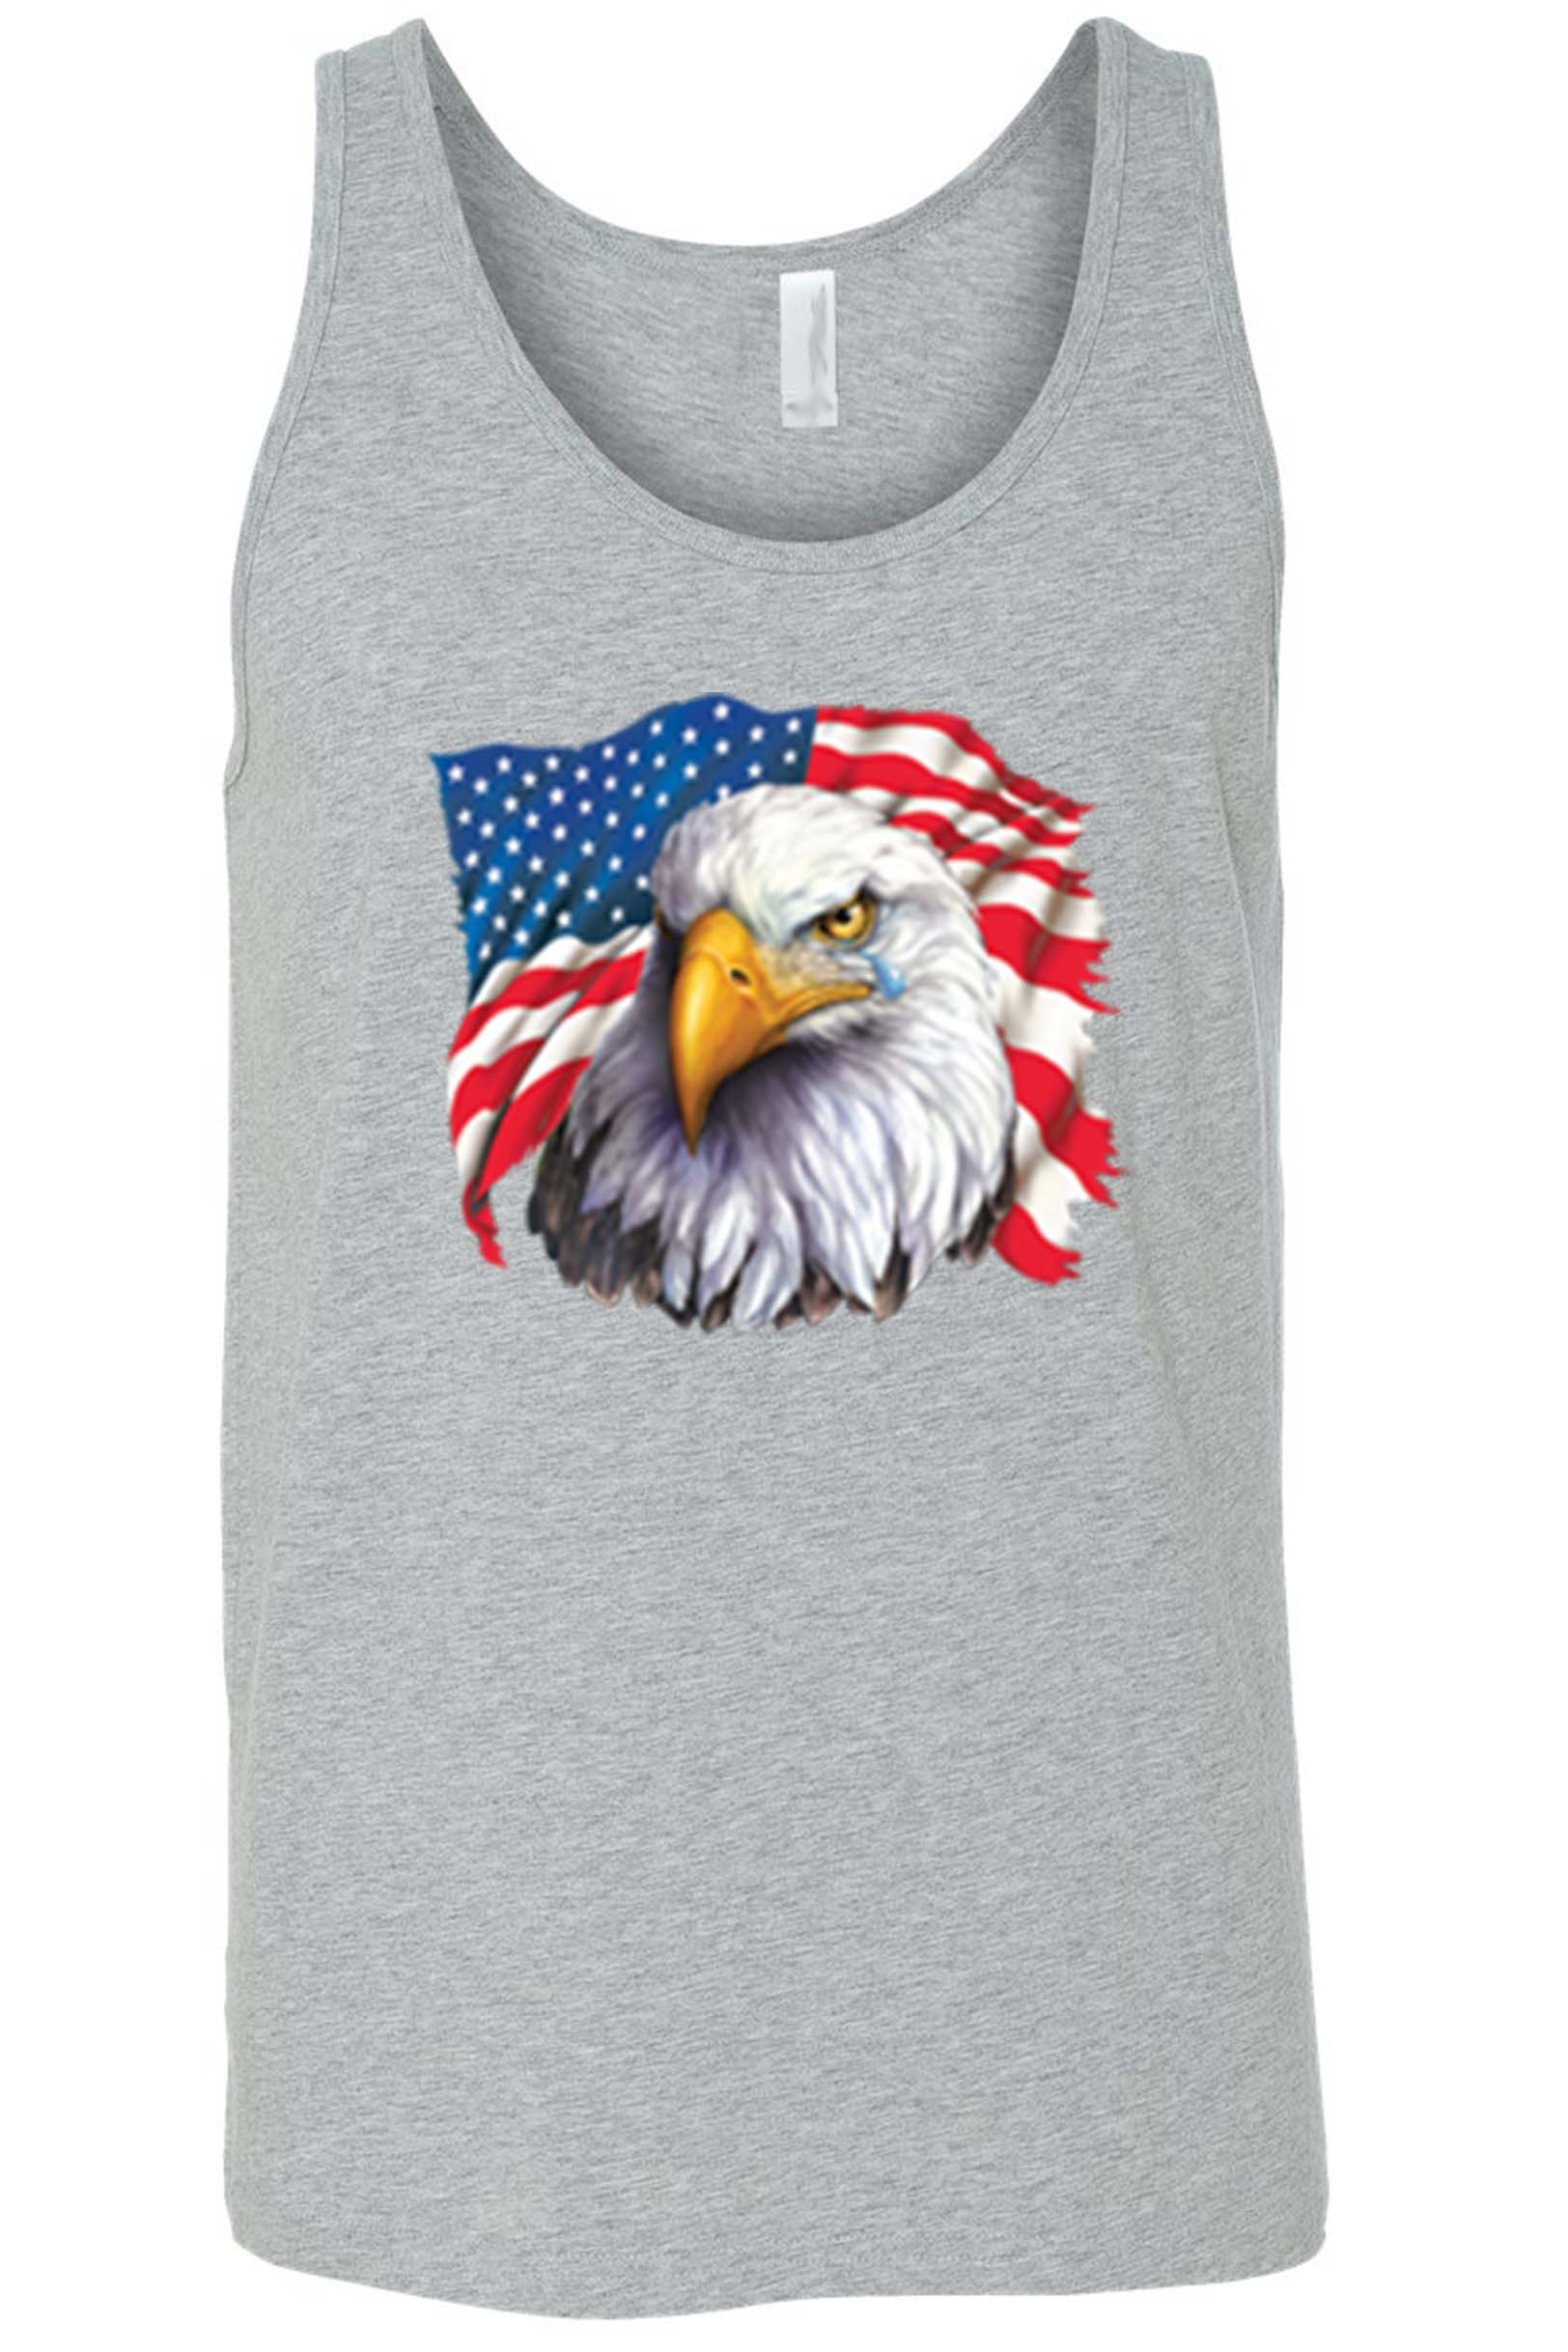 Men's USA Flag Bald Eagle w/ Tear Tank Top Shirt